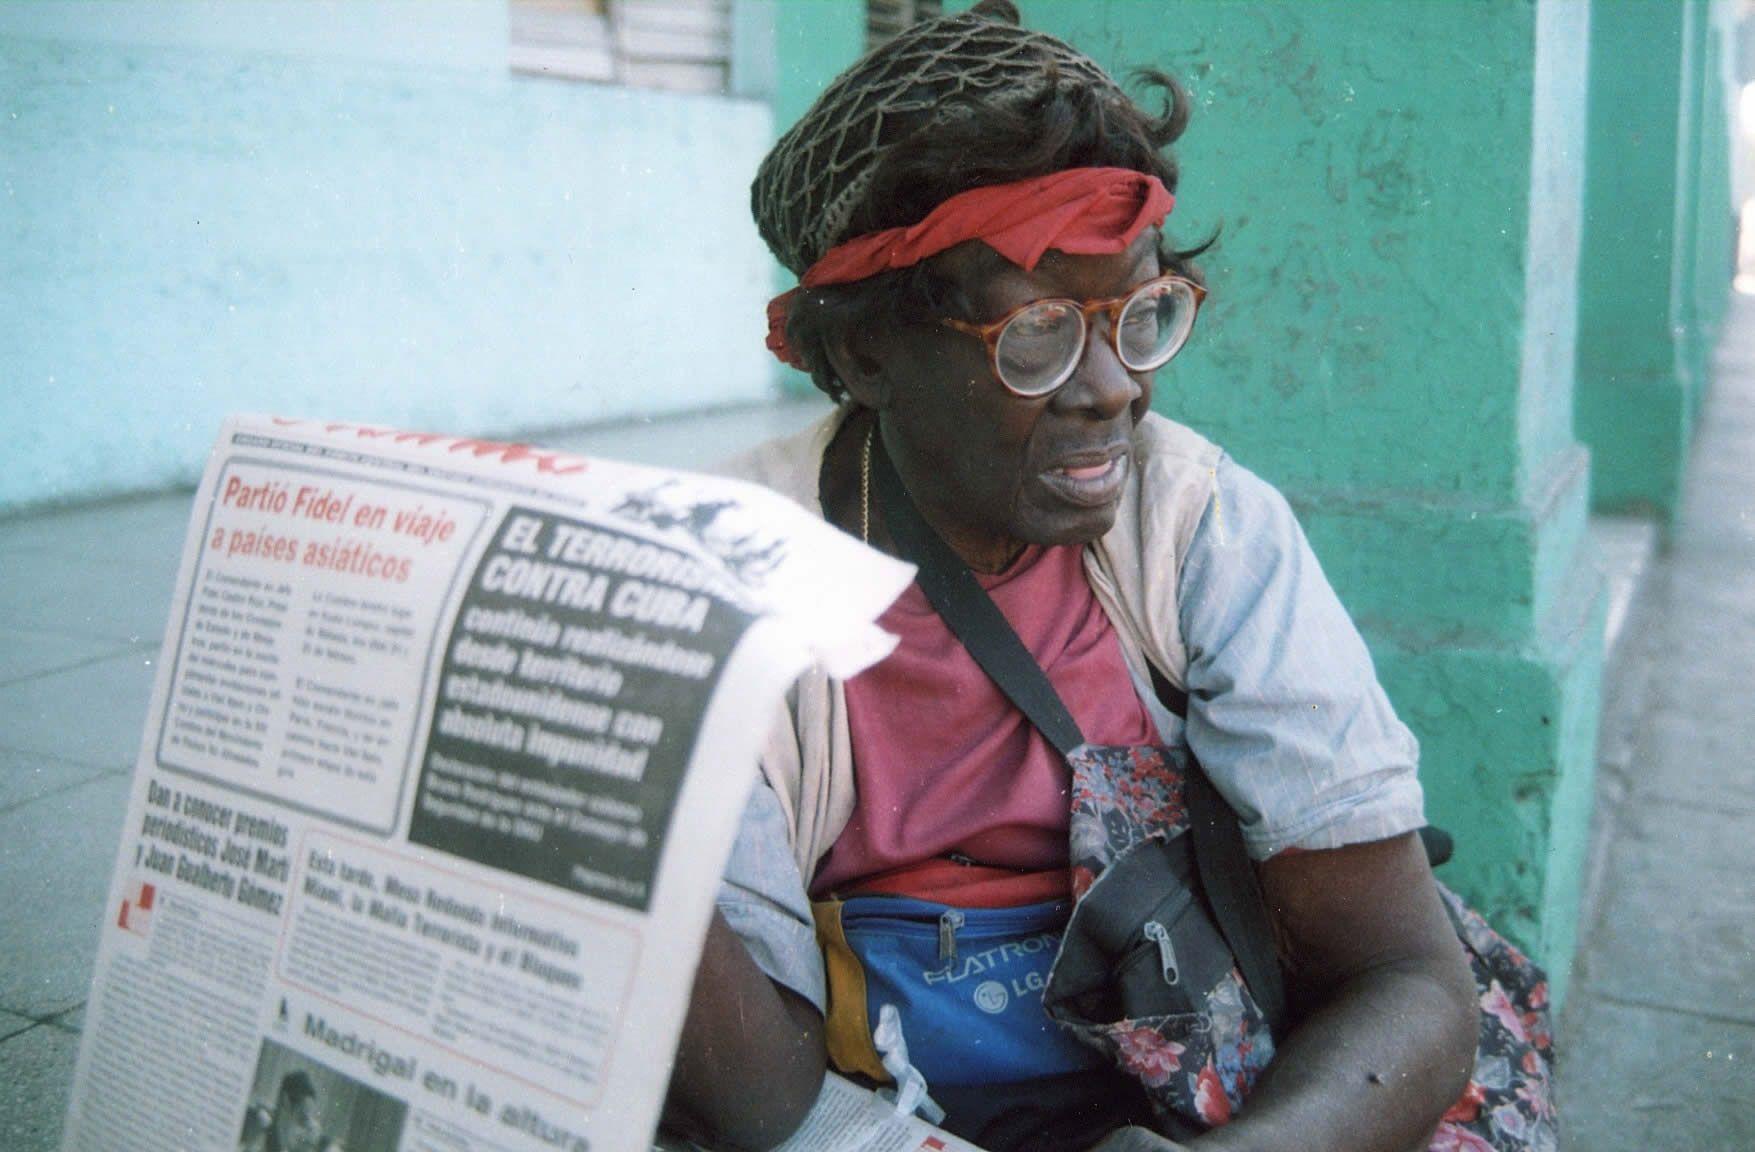 La vendedora de periódicos (Vota por esta obra en observarte.net)